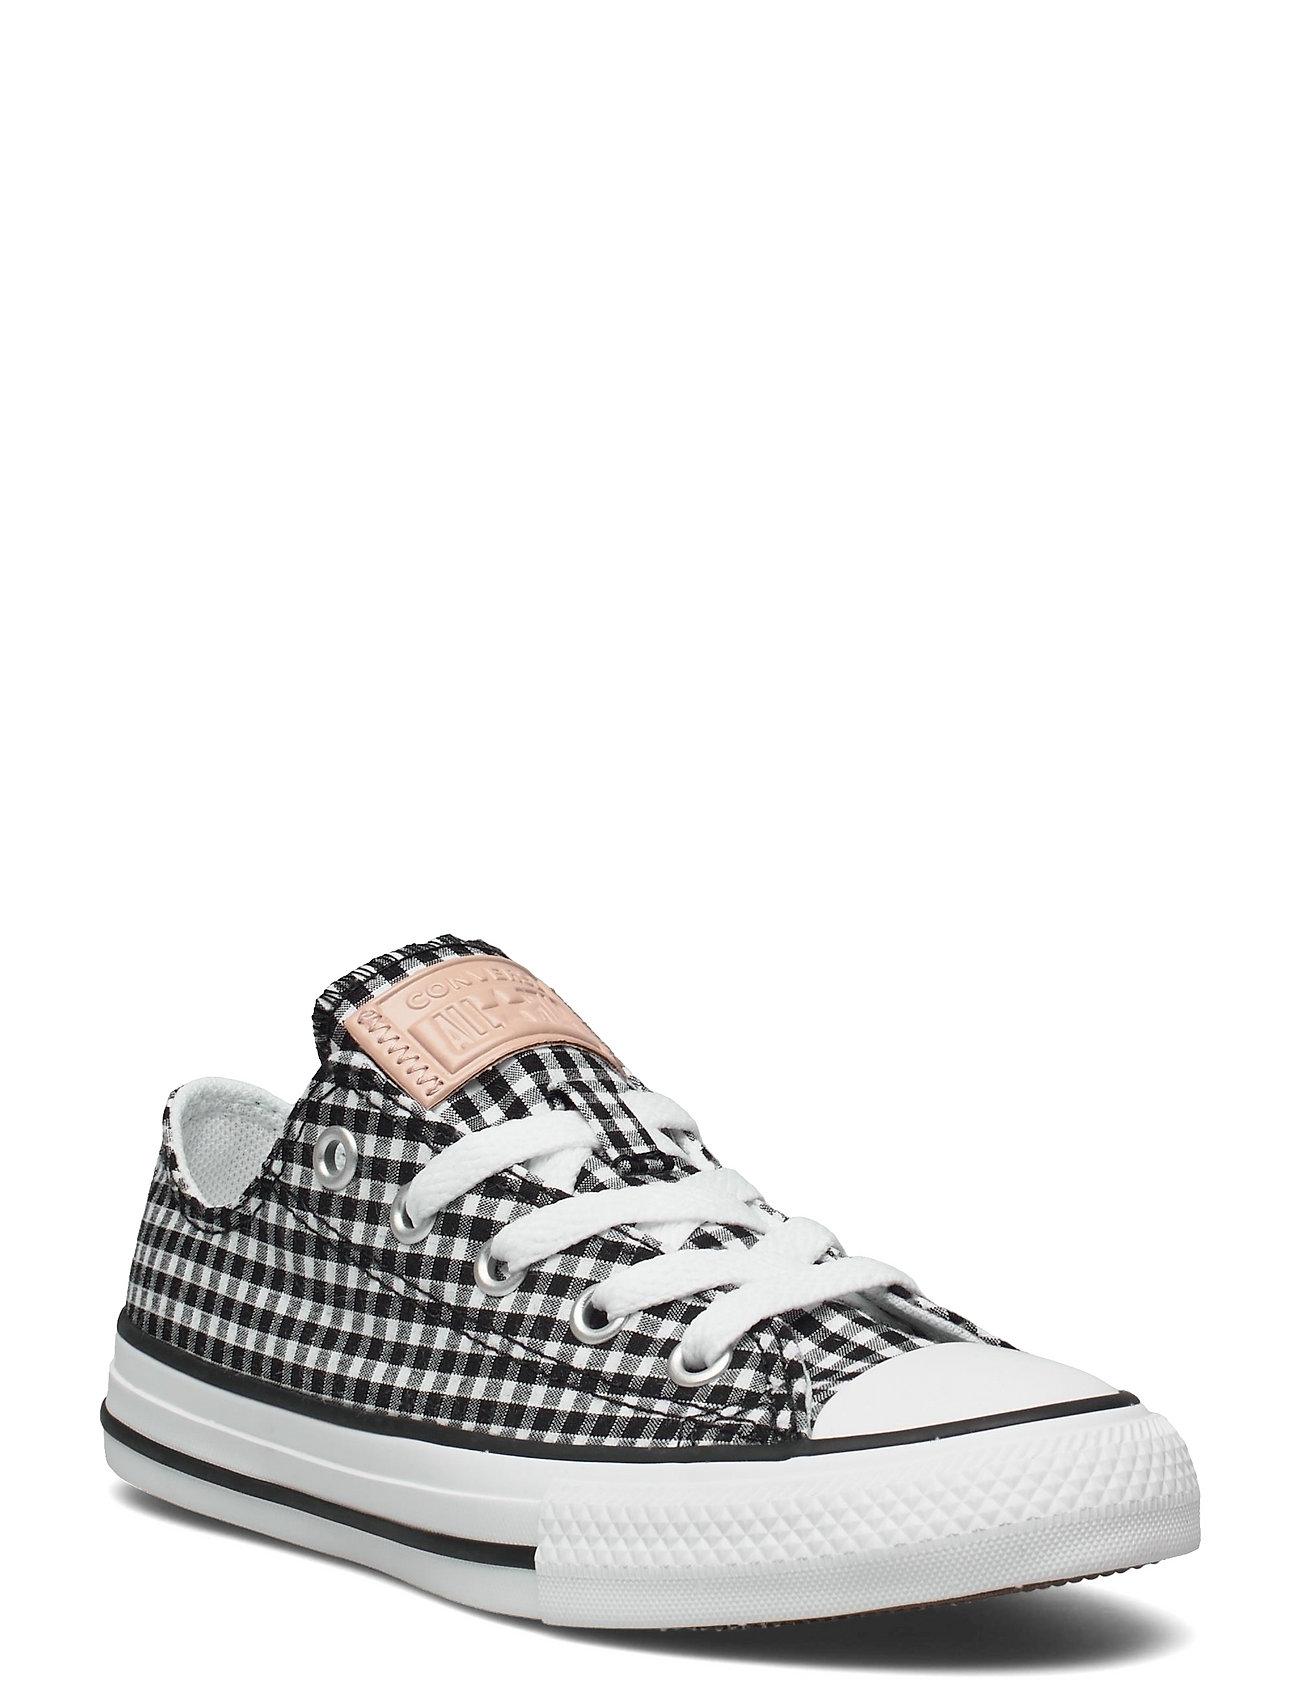 Image of Ctas Ox Black/White/Black Low-top Sneakers Hvid Converse (3534189937)